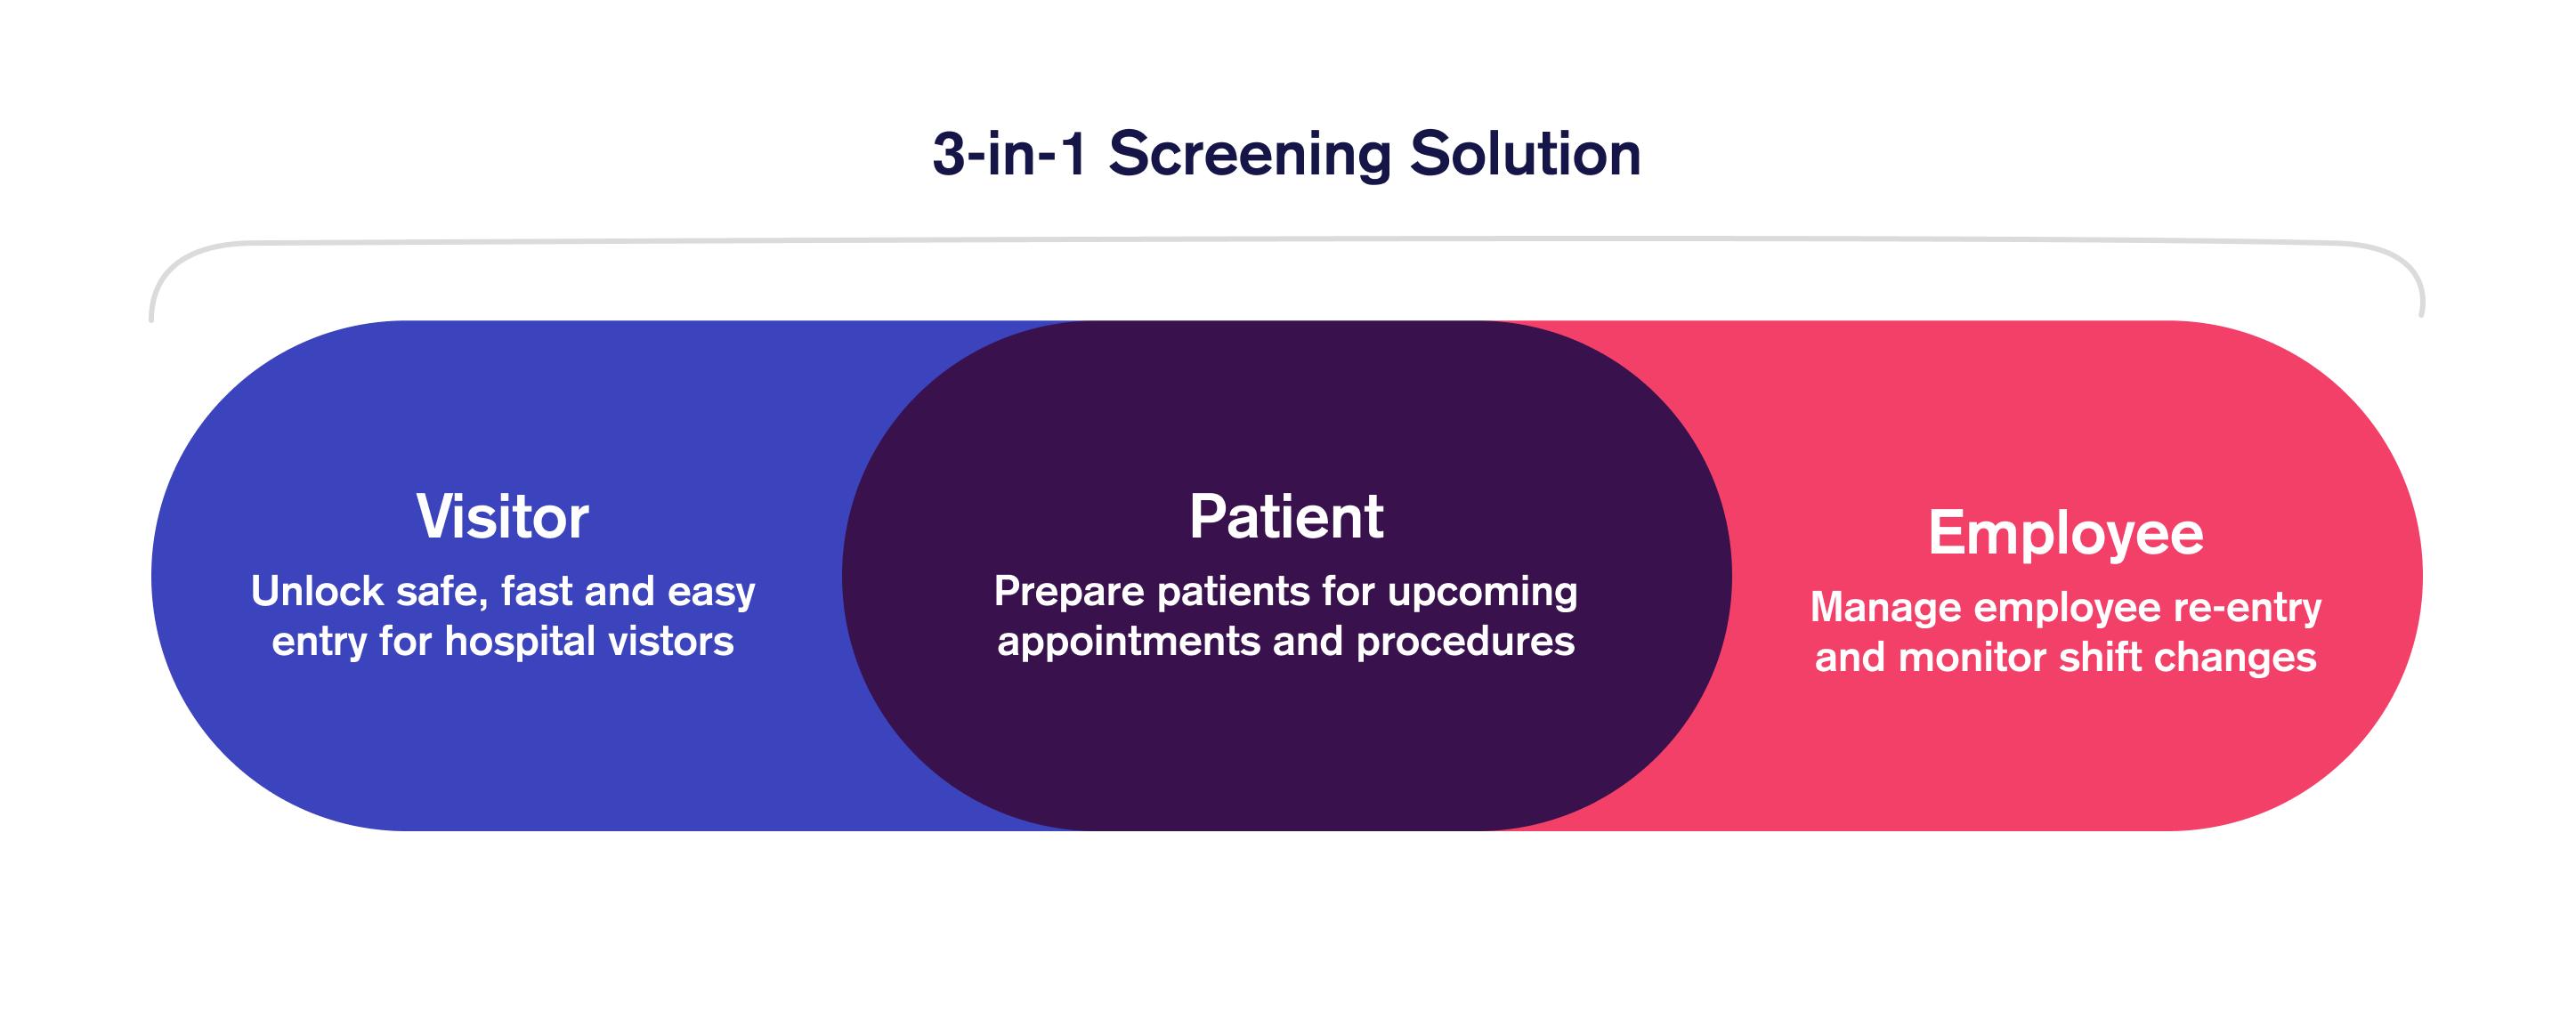 3-in-1 Screening Solution